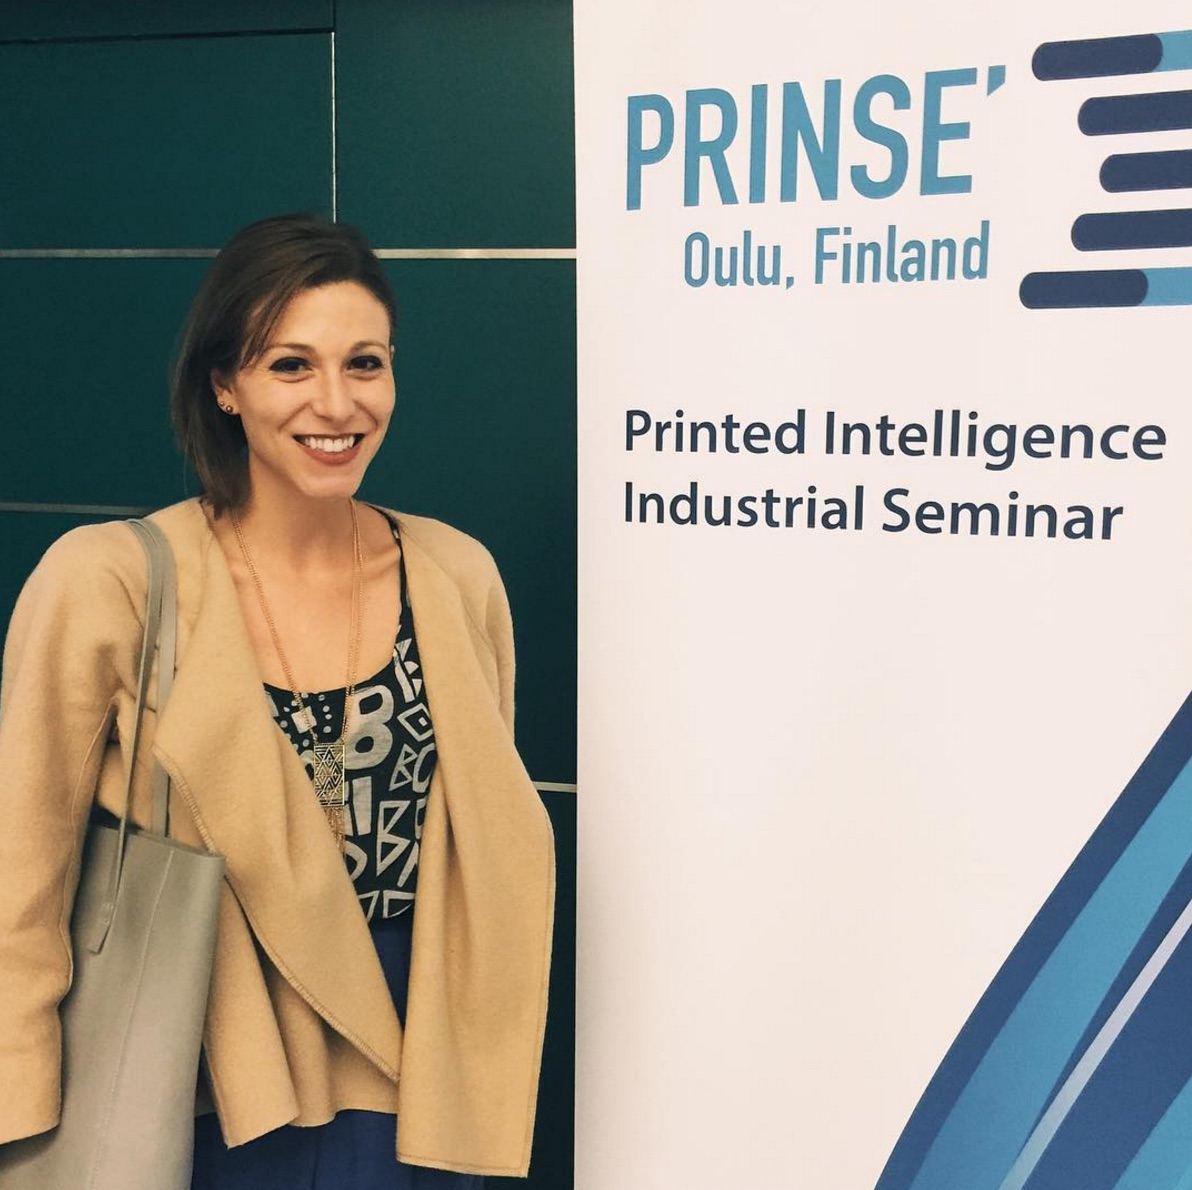 Amanda at Prinse 2016 in Oulu, Finland